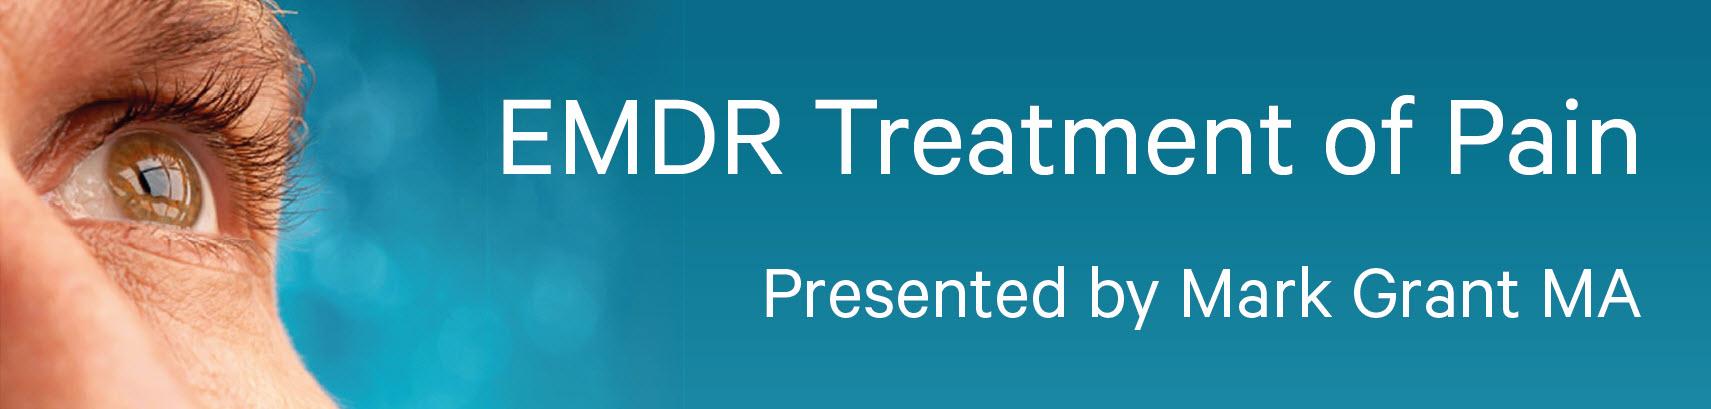 EMDR Treatment of Pain Workshop - Hobart and Perth, Australia -2018